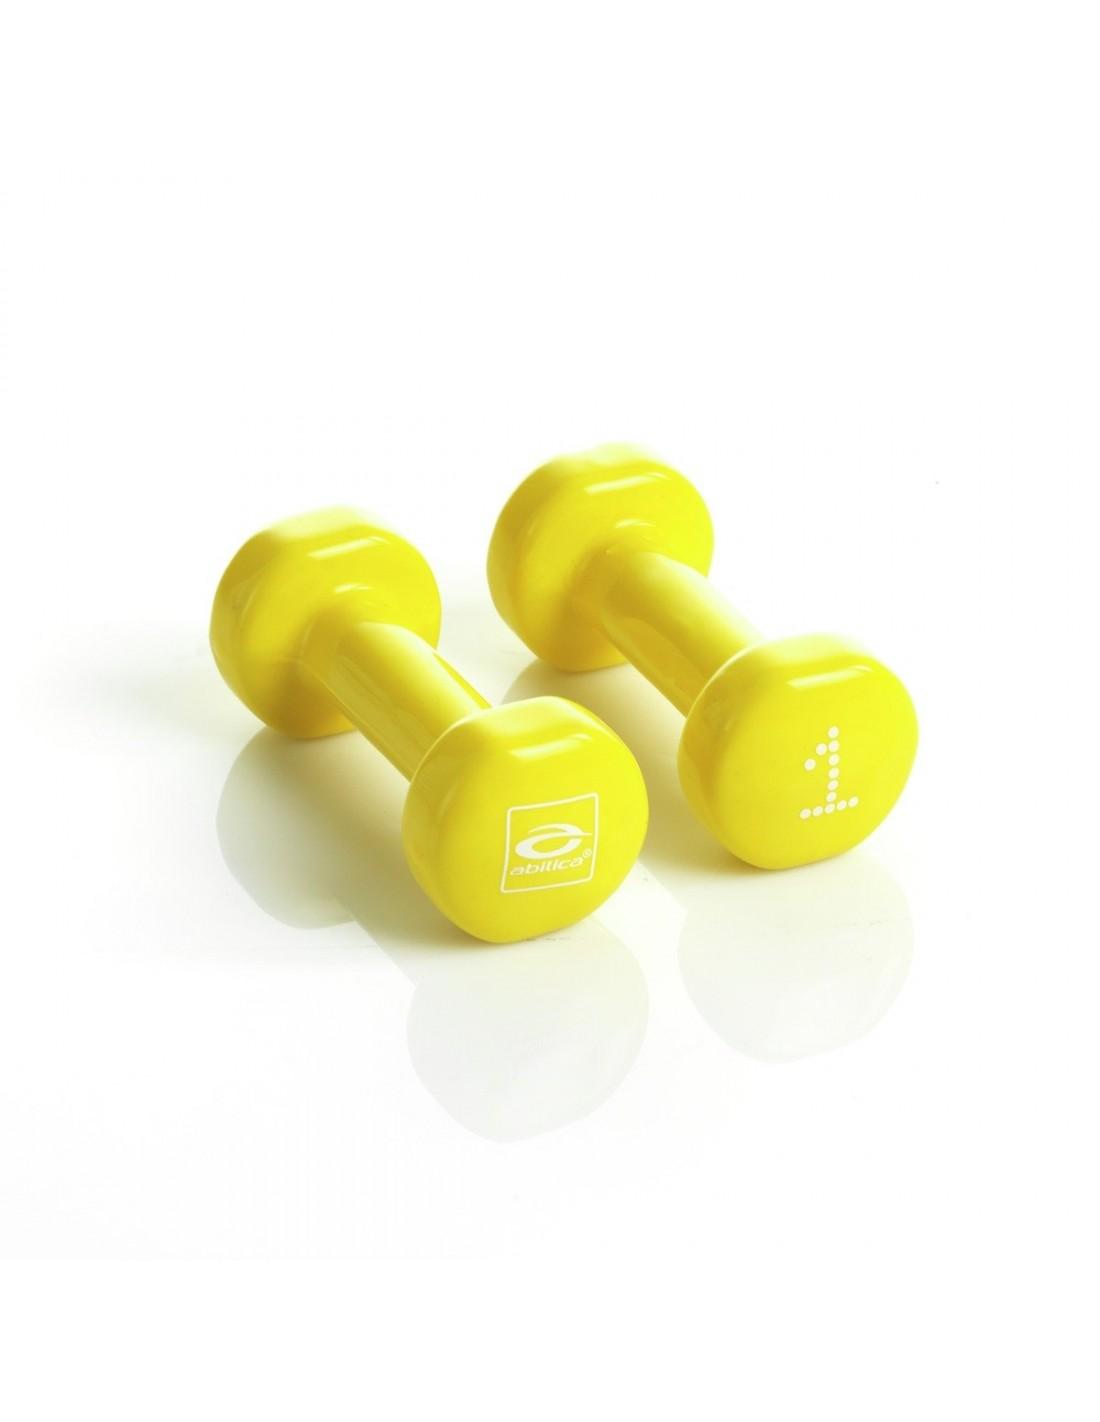 Abilica DumbBells 1kg 1 Yellow